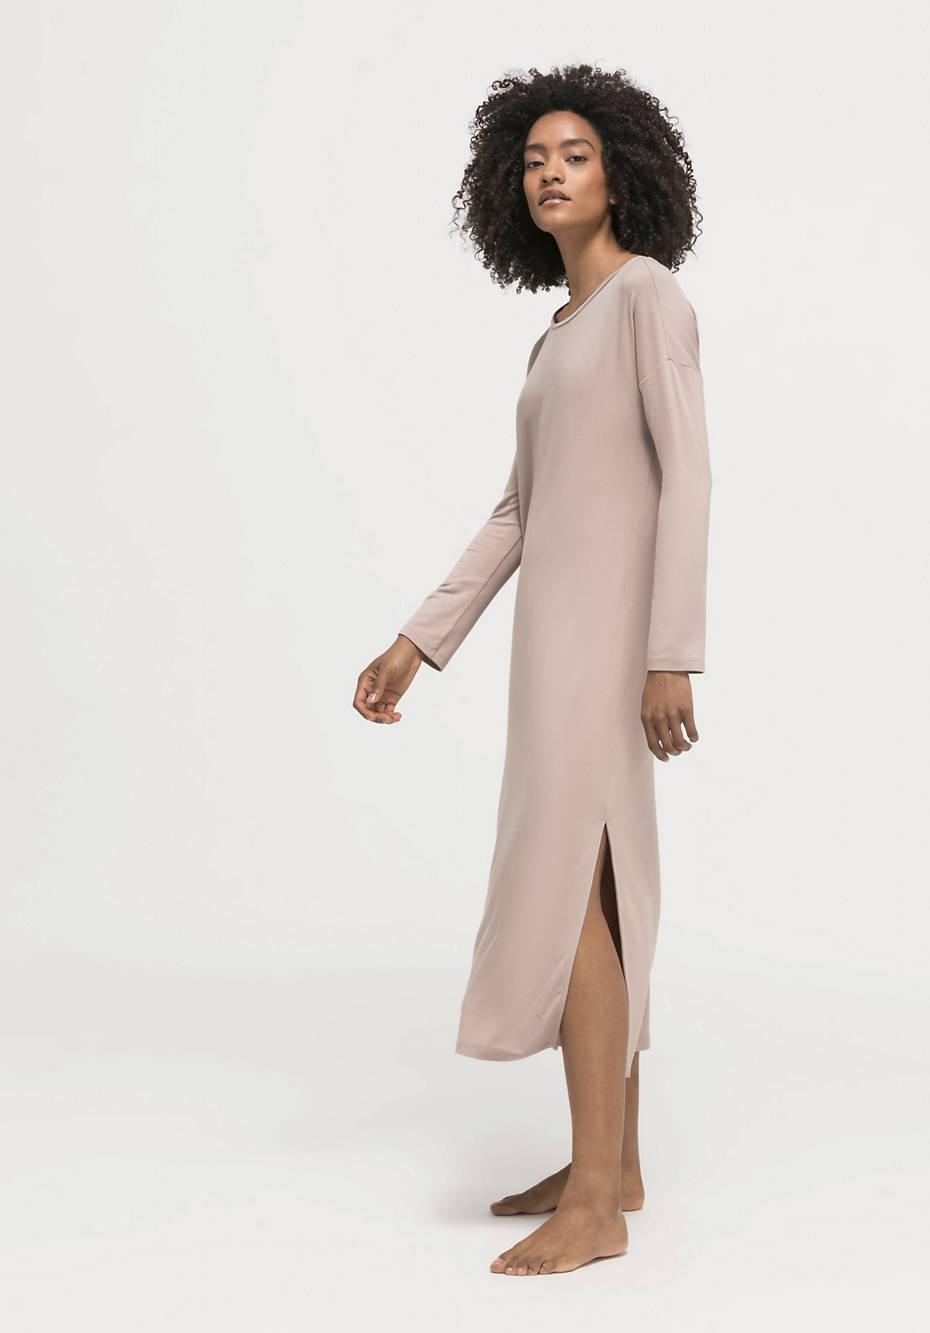 Nightdress made from TENCEL ™ Modal